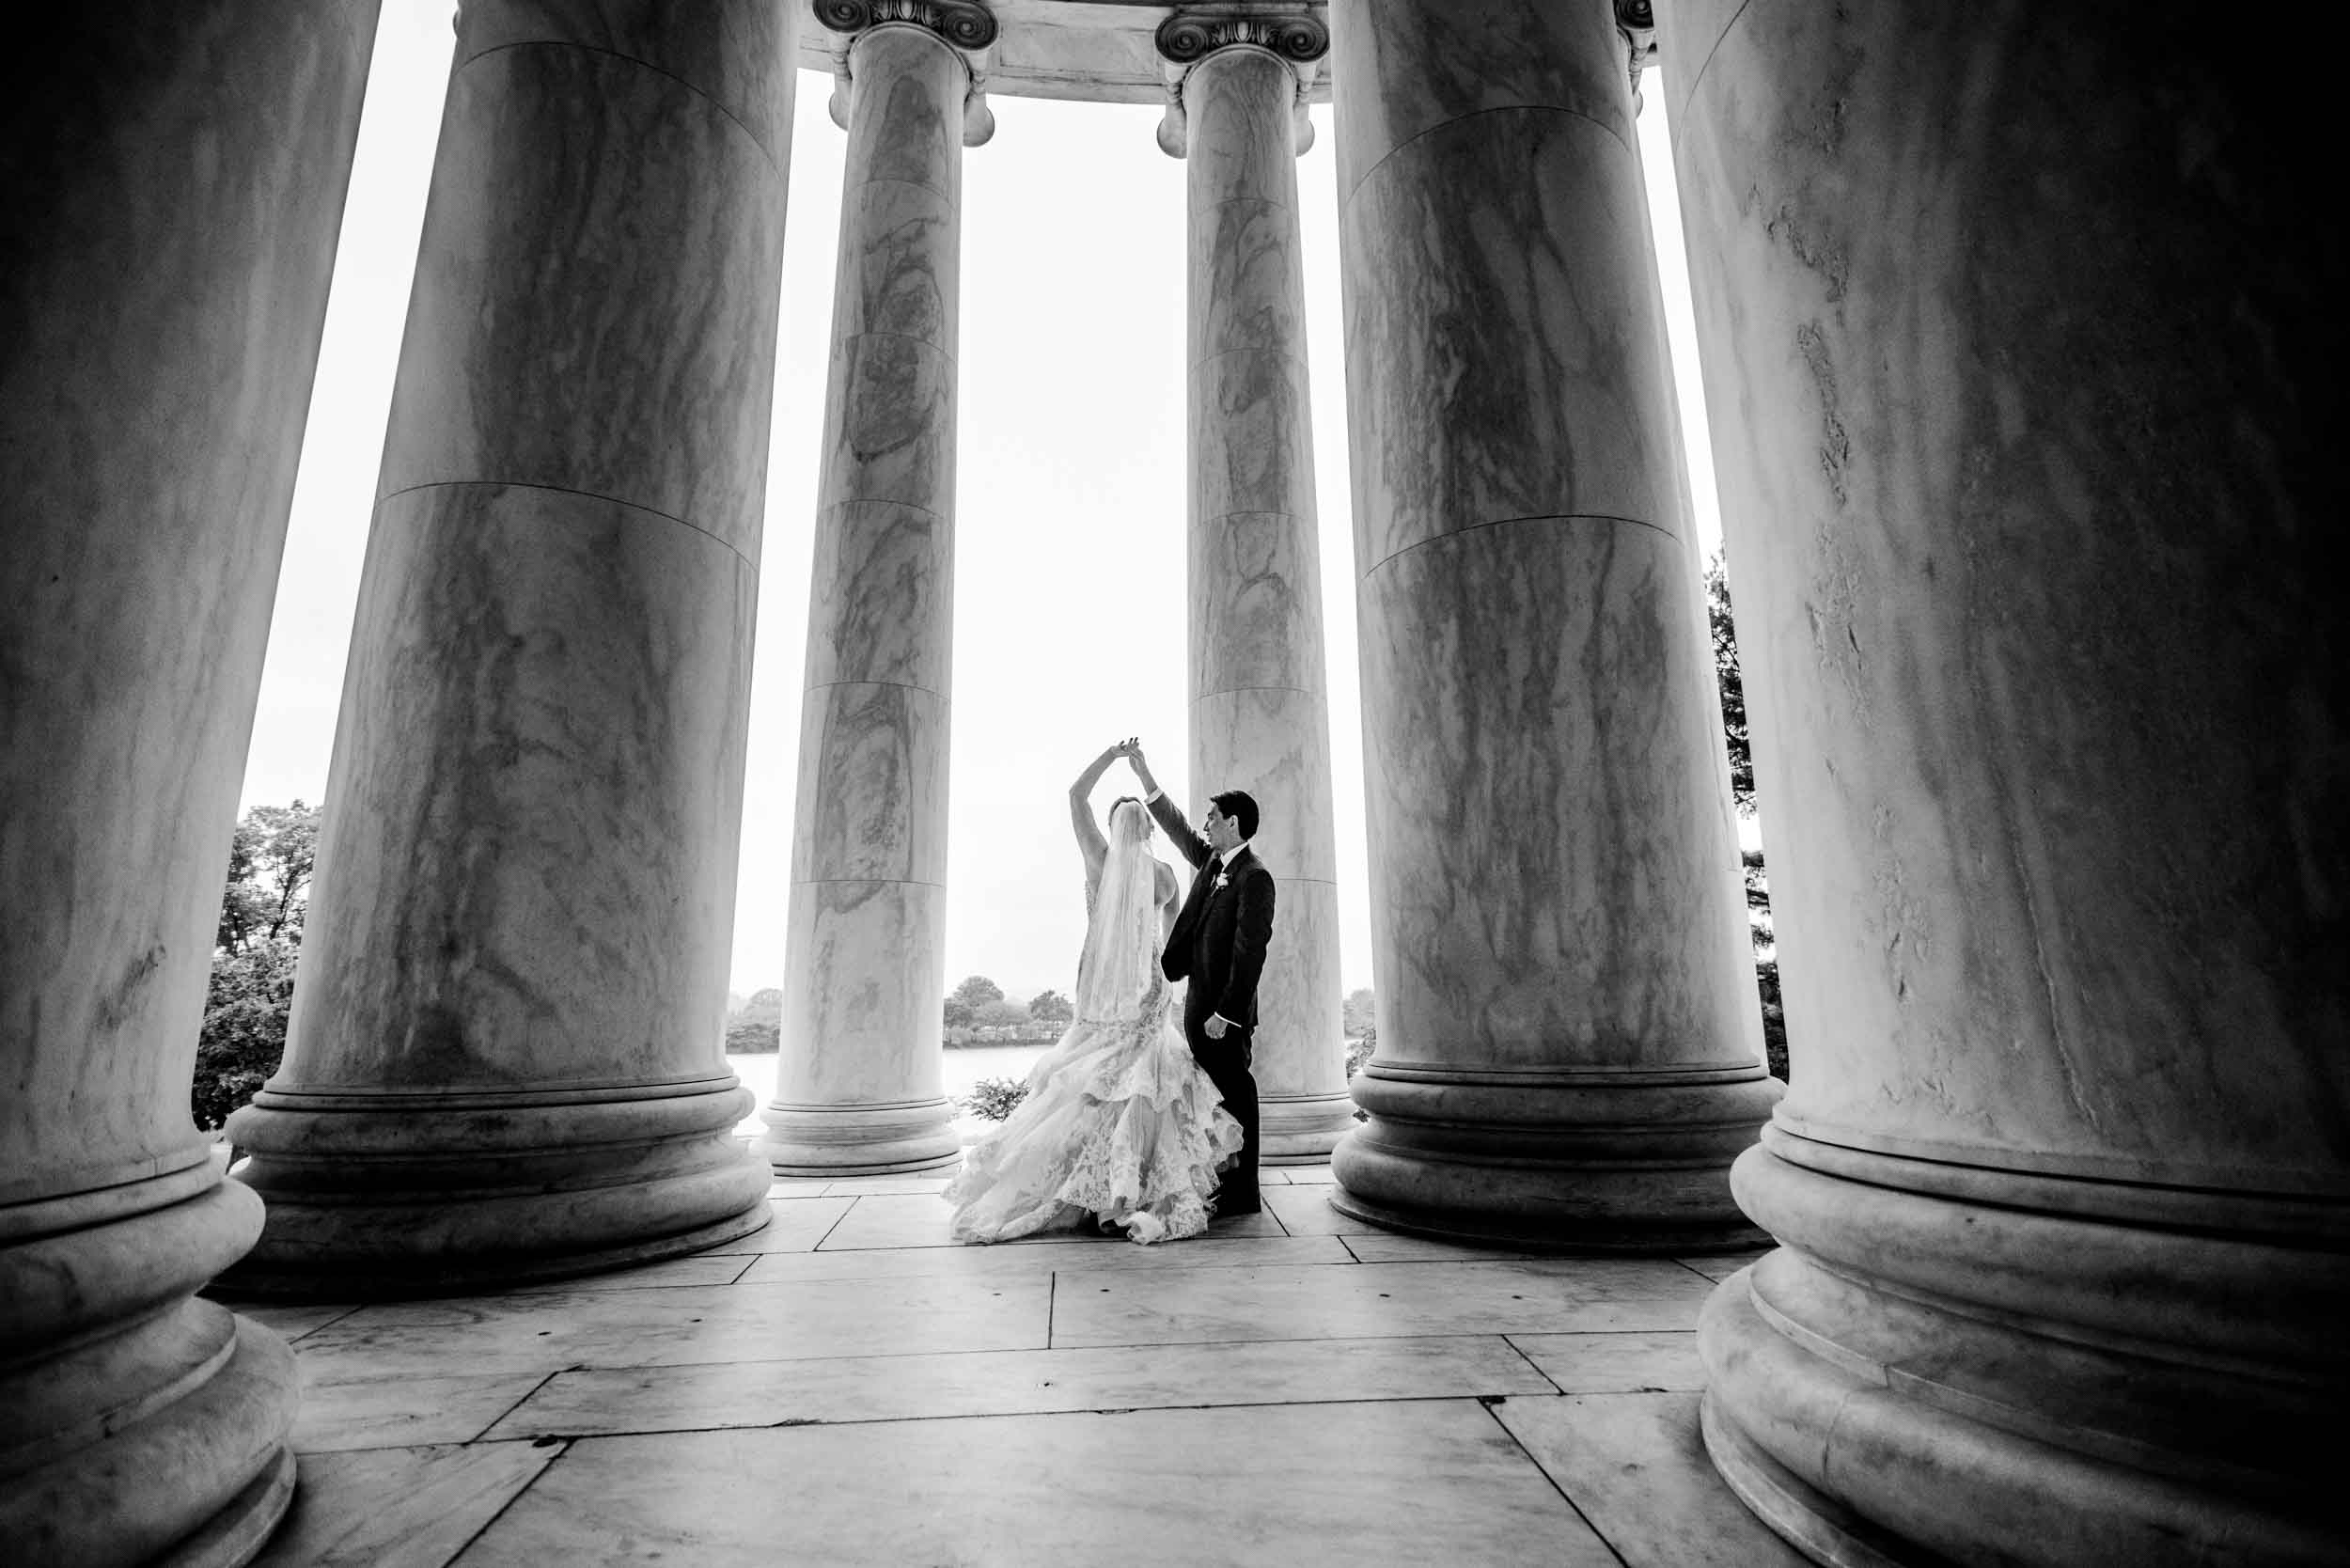 dc+metro+wedding+photographer+vadym+guliuk+photography+wedding+bride+and+groom-2039.jpg